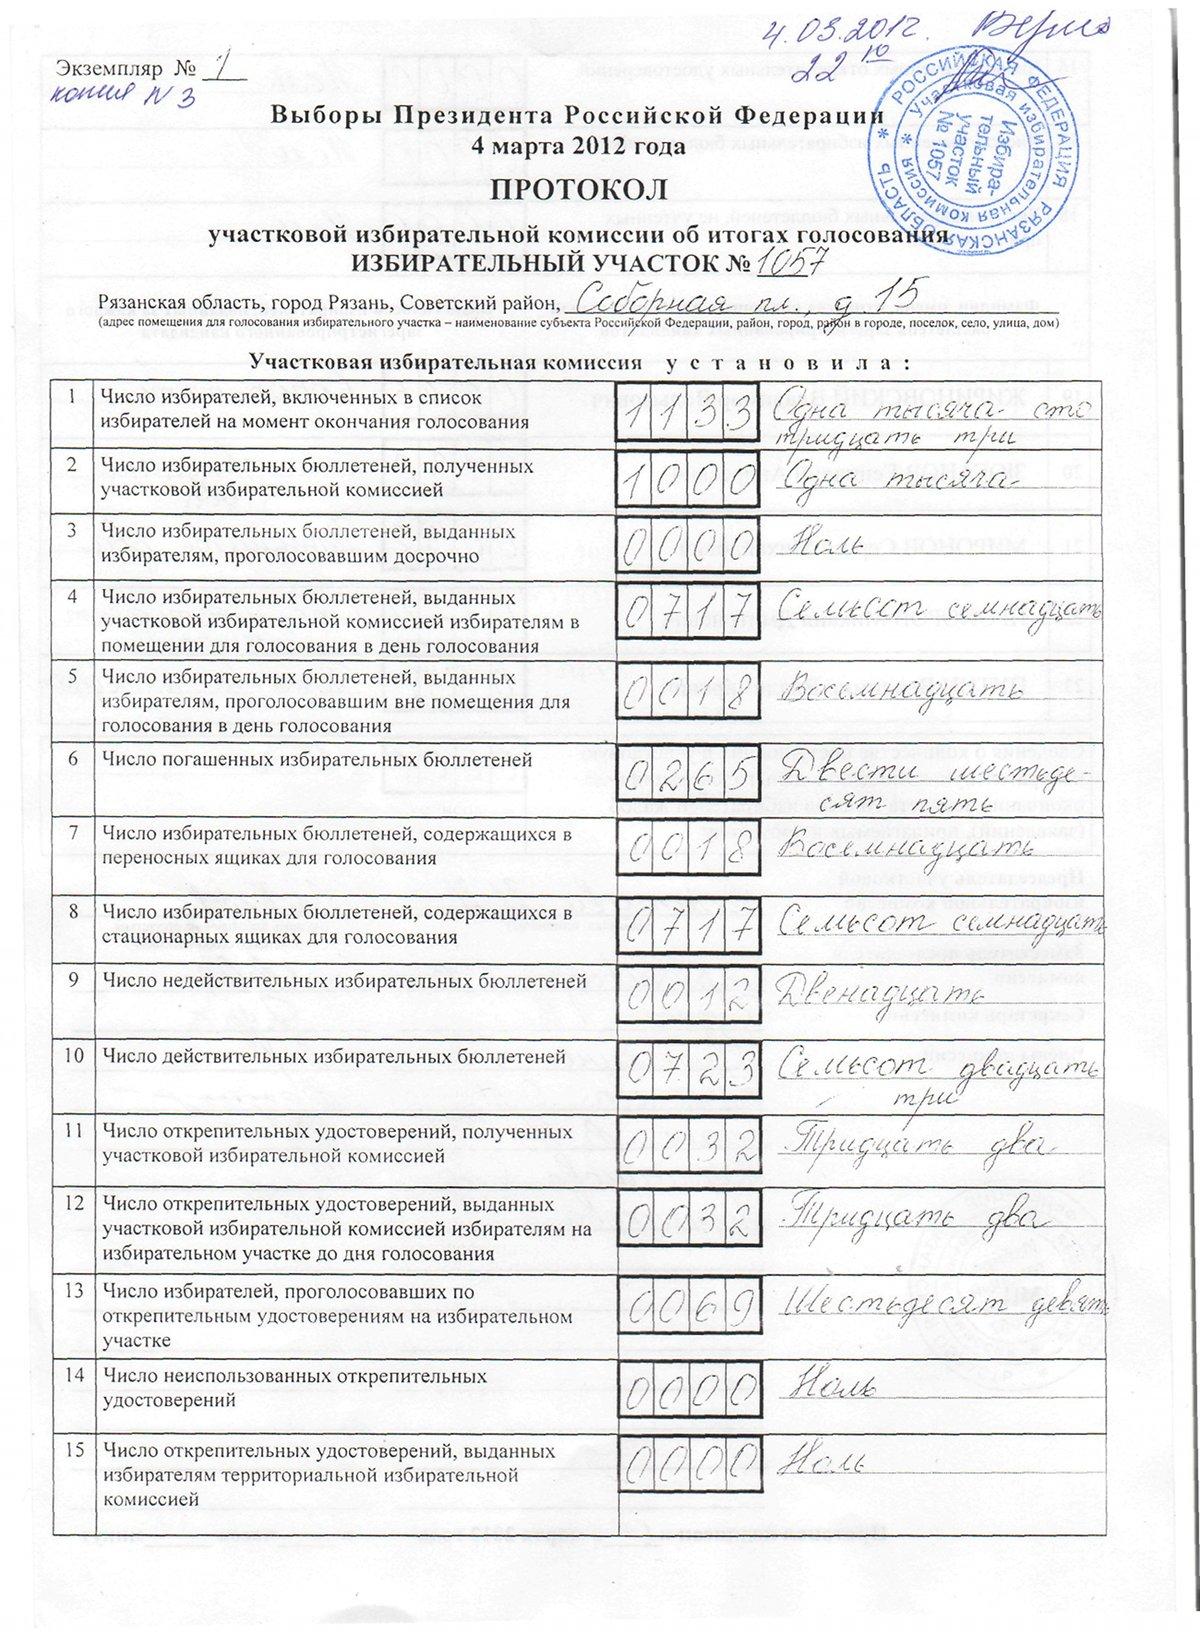 Копия протокола УИК 1057